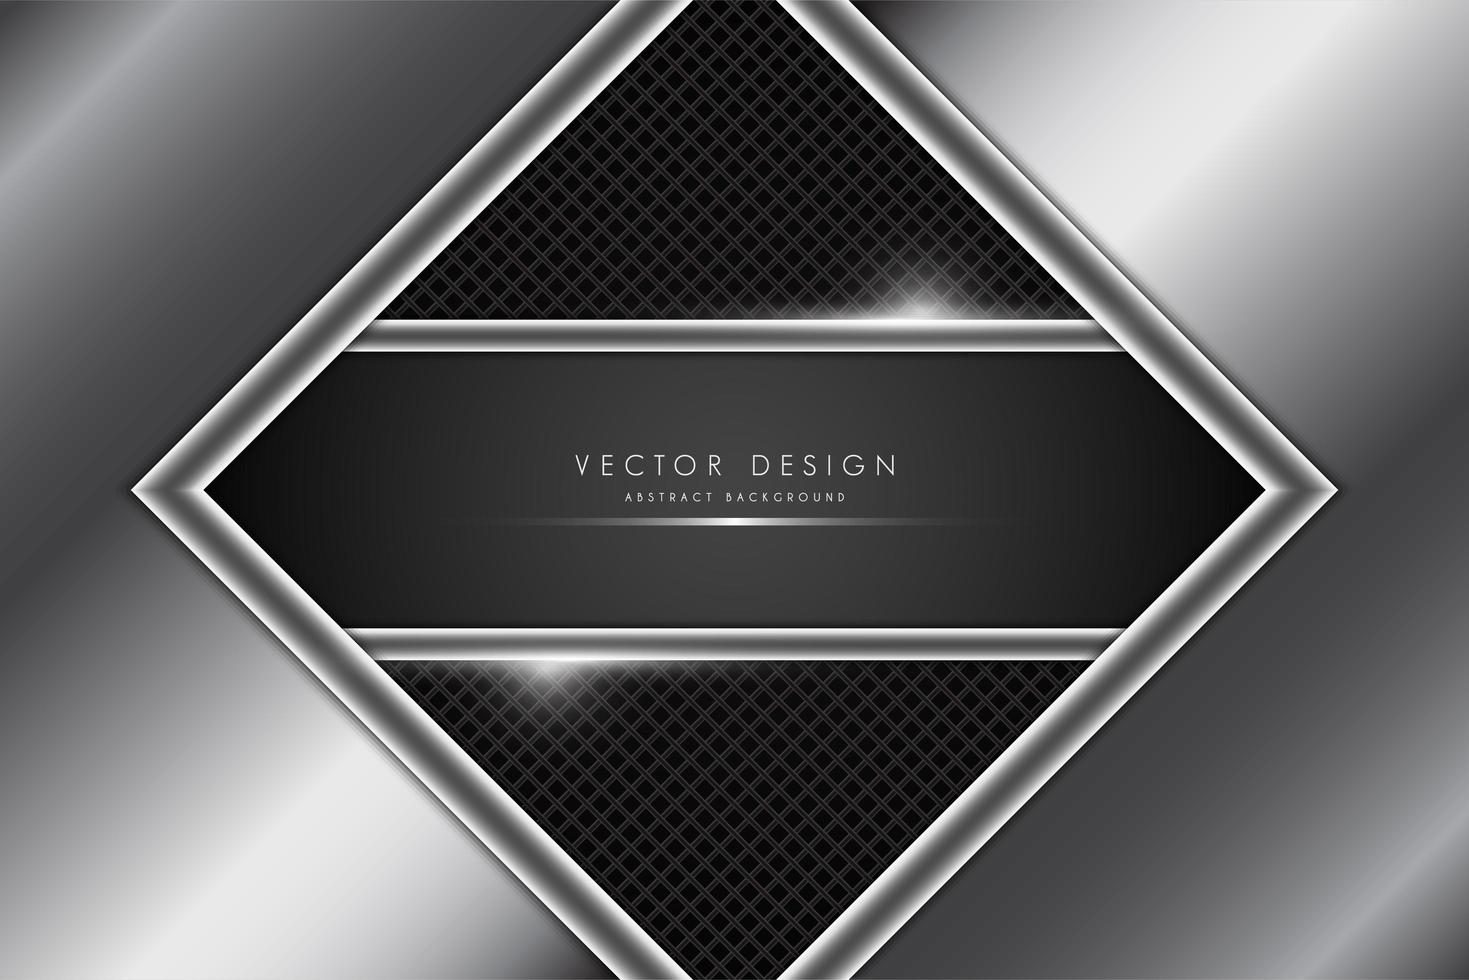 Metallic Grau und Silber Diamantrahmen vektor